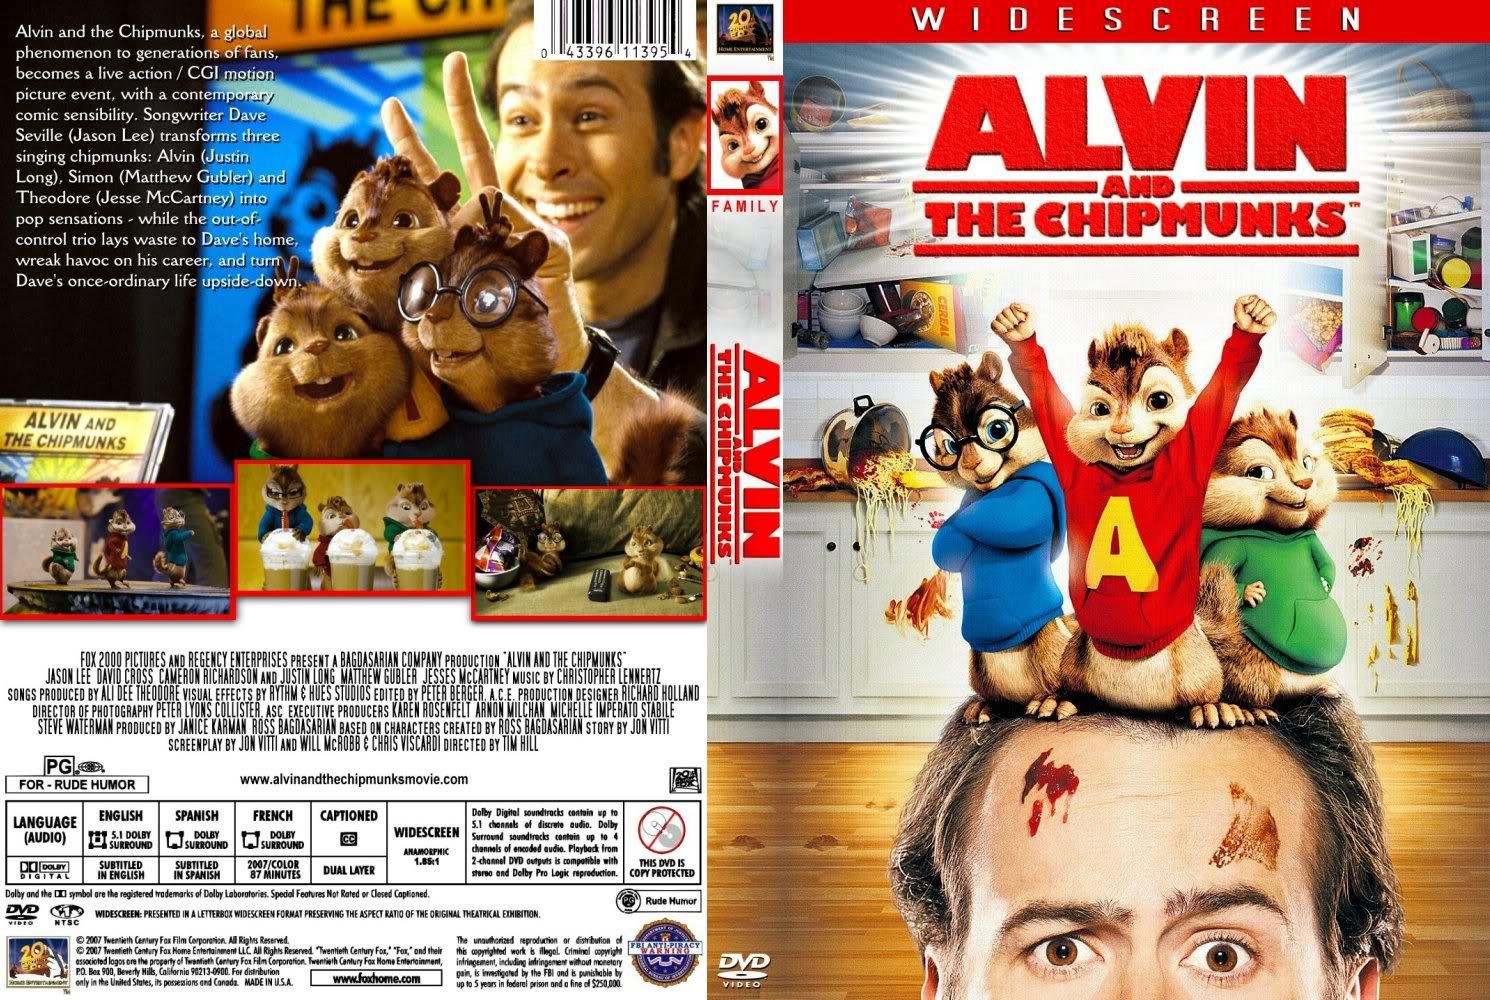 Alvin And The Chipmunks 2014 Alvin-and-the-chipmunks